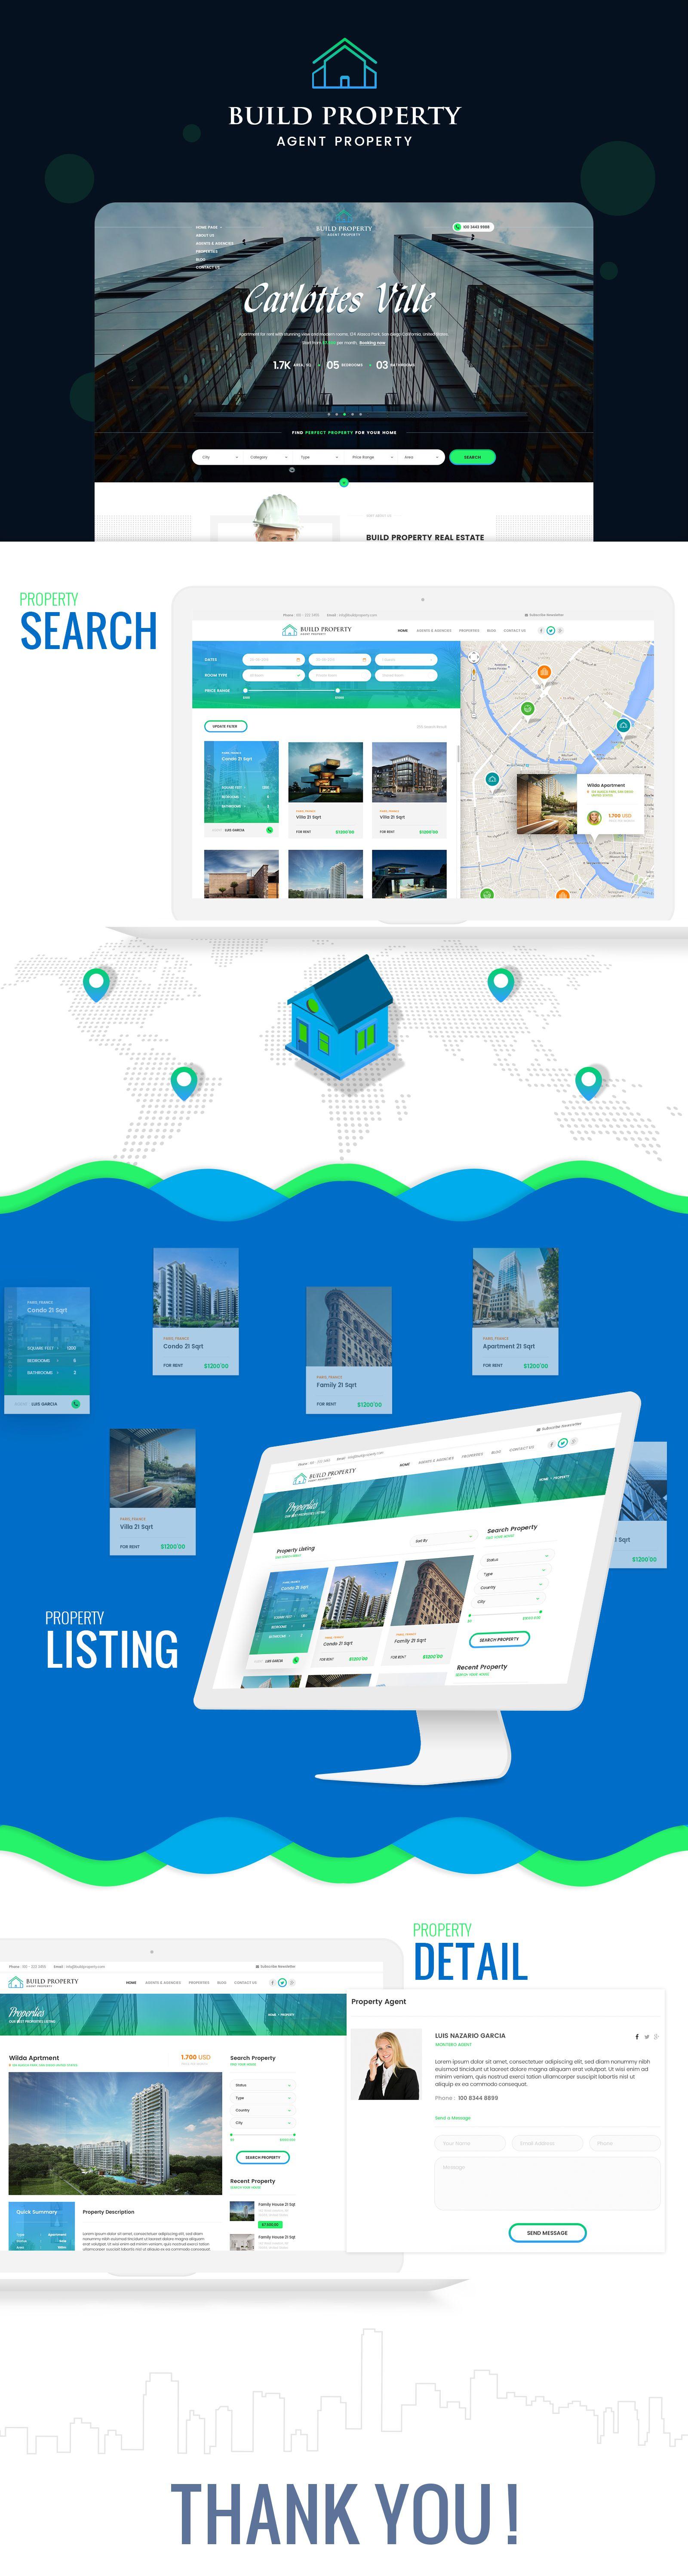 Build Property Portfolio Website Design Development Company Web - Web development company website template